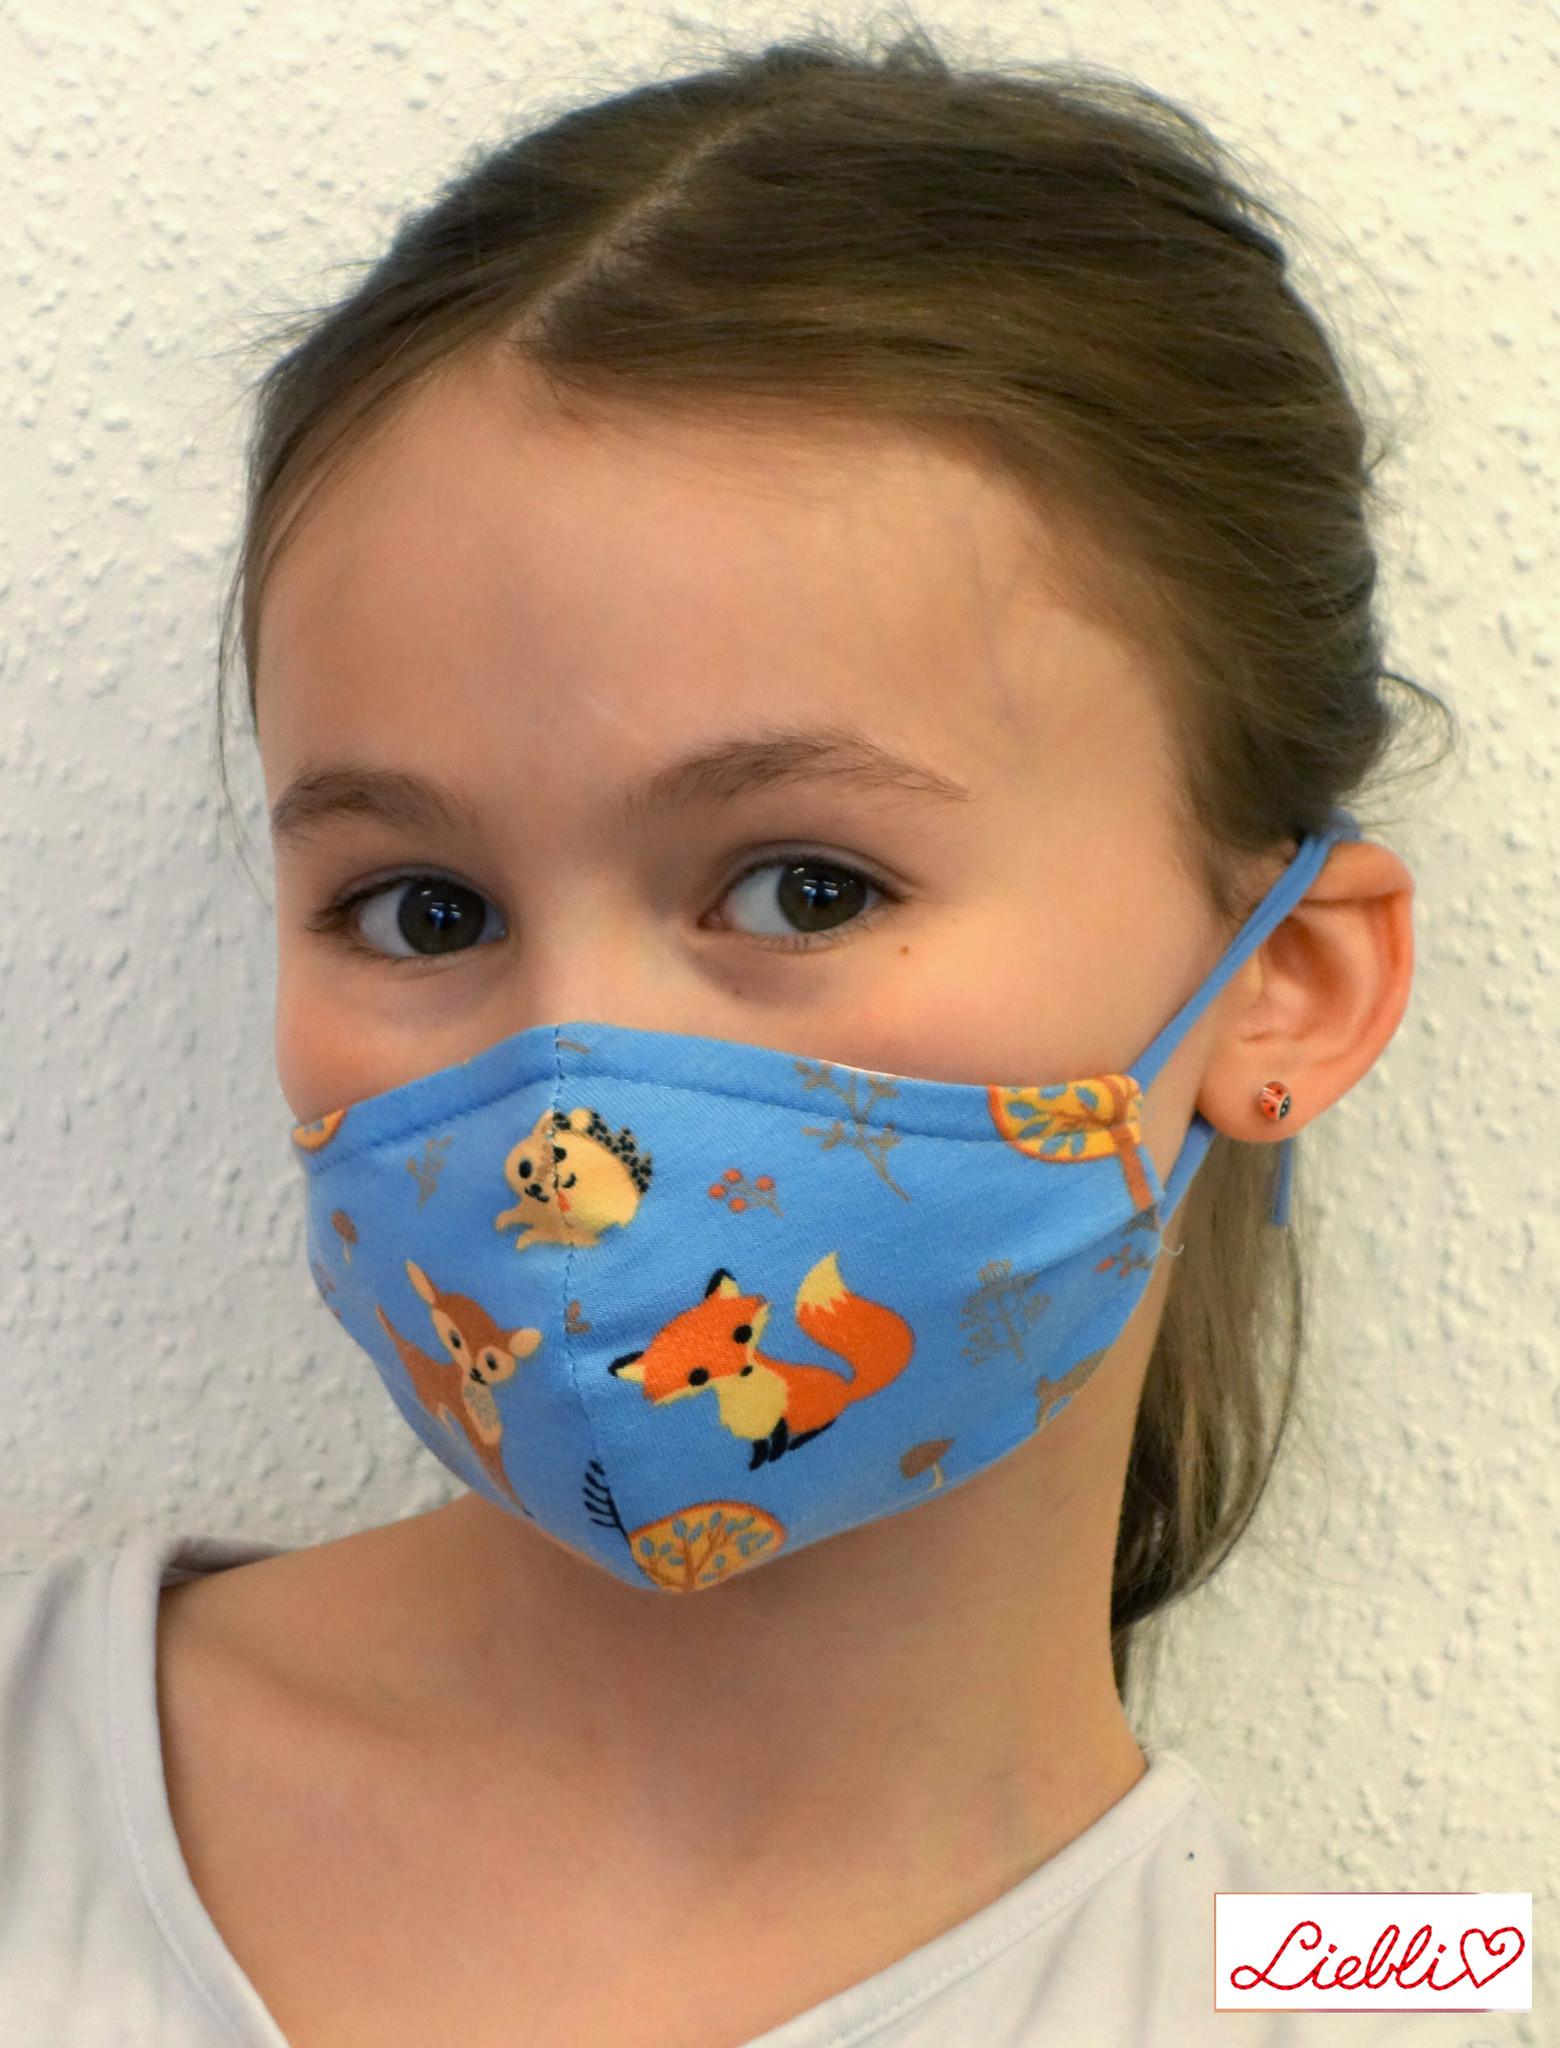 Kindermaske, Kinder Mundschutz, Mund-Nasen-Maske Waldtiere hellblau